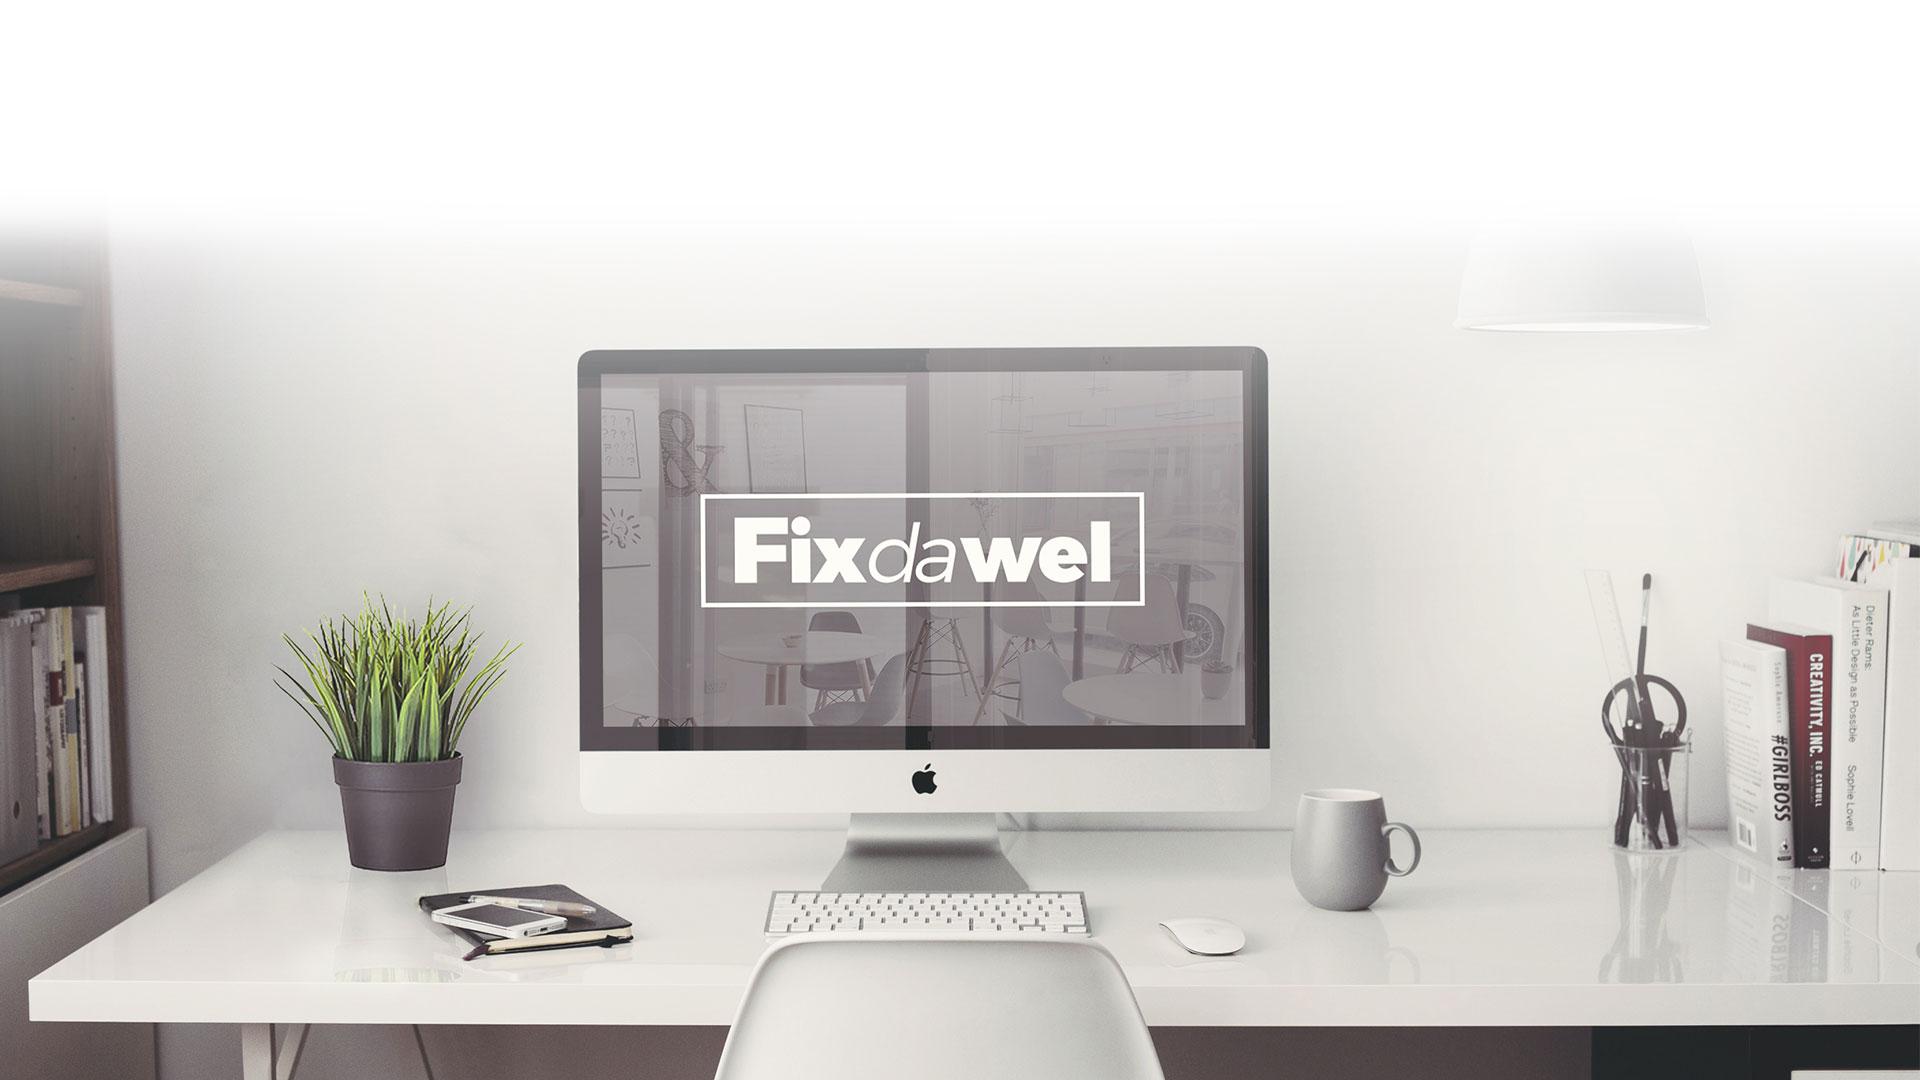 Fixdawel Webdesign, Antwerpen